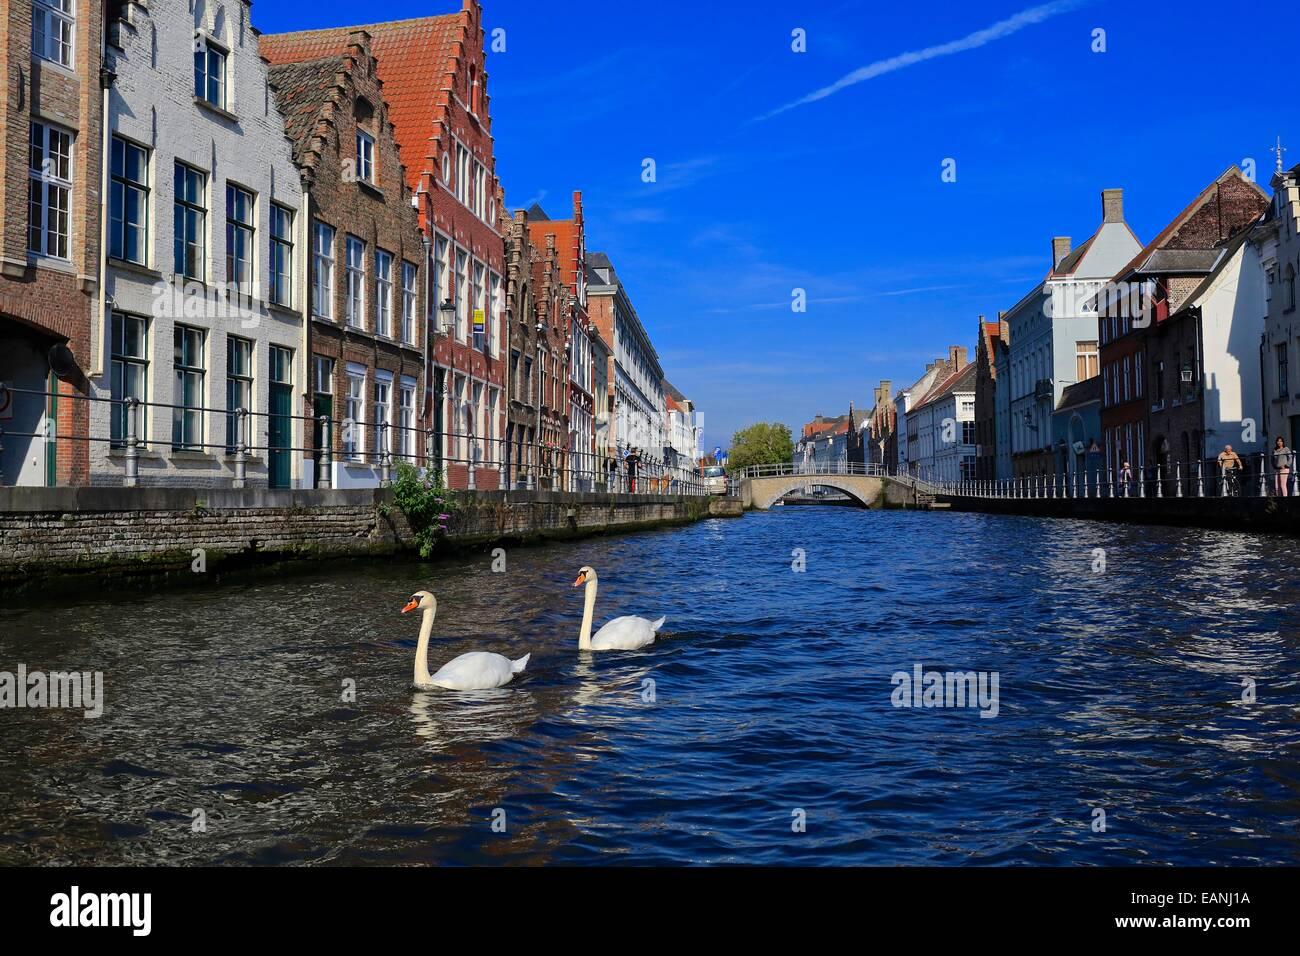 Brügge alte Stadt Canal Szene zeigt Brücke über St Annarei Kanal, Belgien. Brügge-Kanal Szene Stockbild